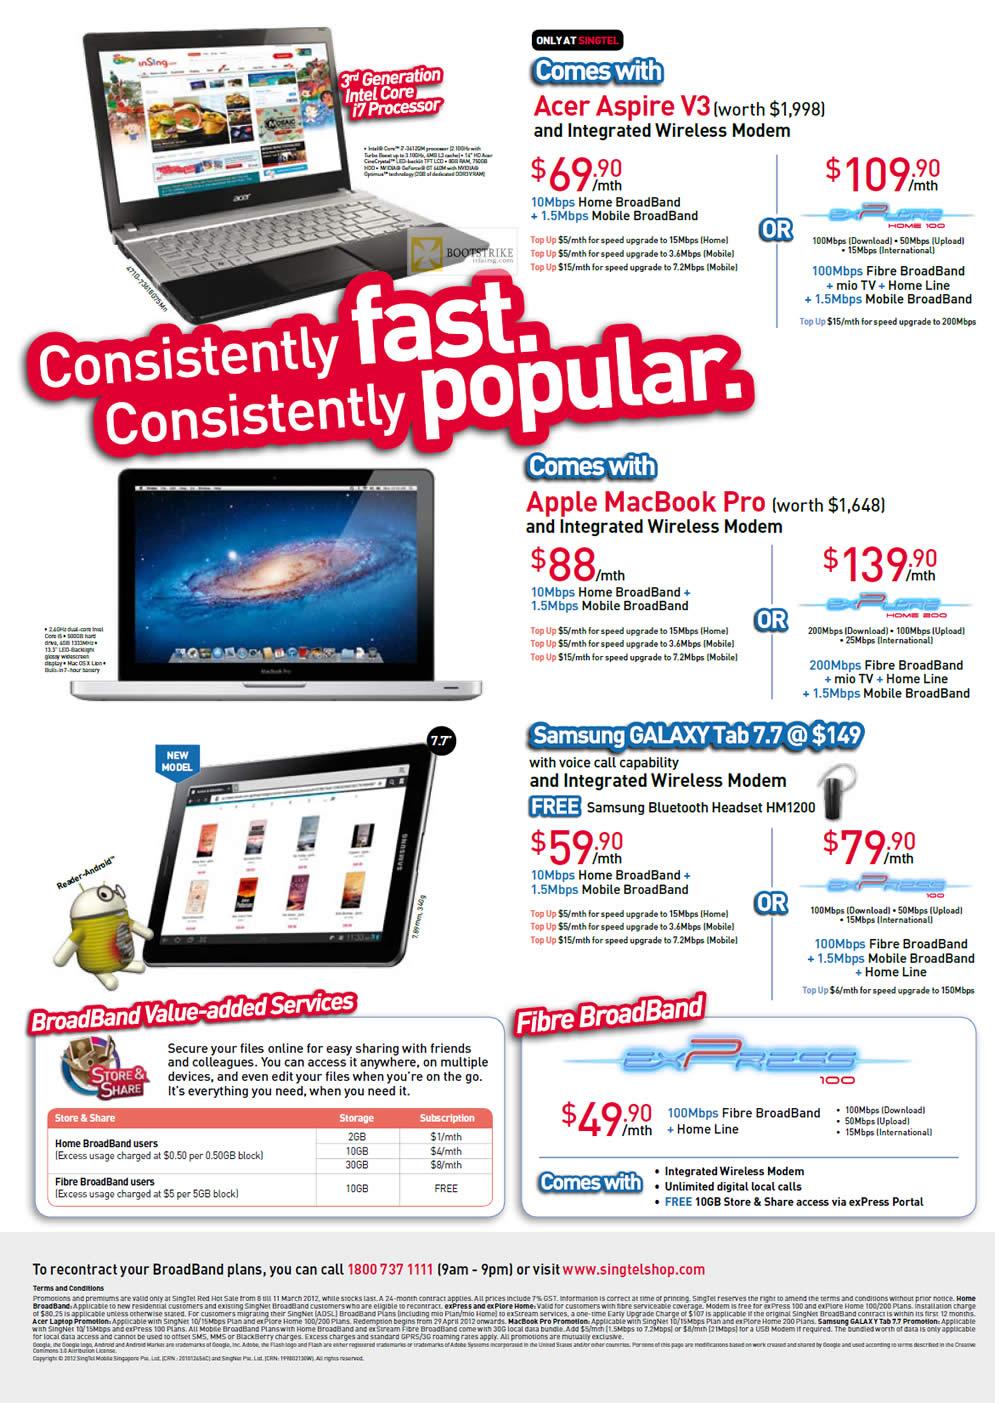 IT SHOW 2012 price list image brochure of Singtel Broadband Acer Aspire V3, Apple Macbook Pro, Samsung Galaxy Tab 7.7, Fibre Express 100